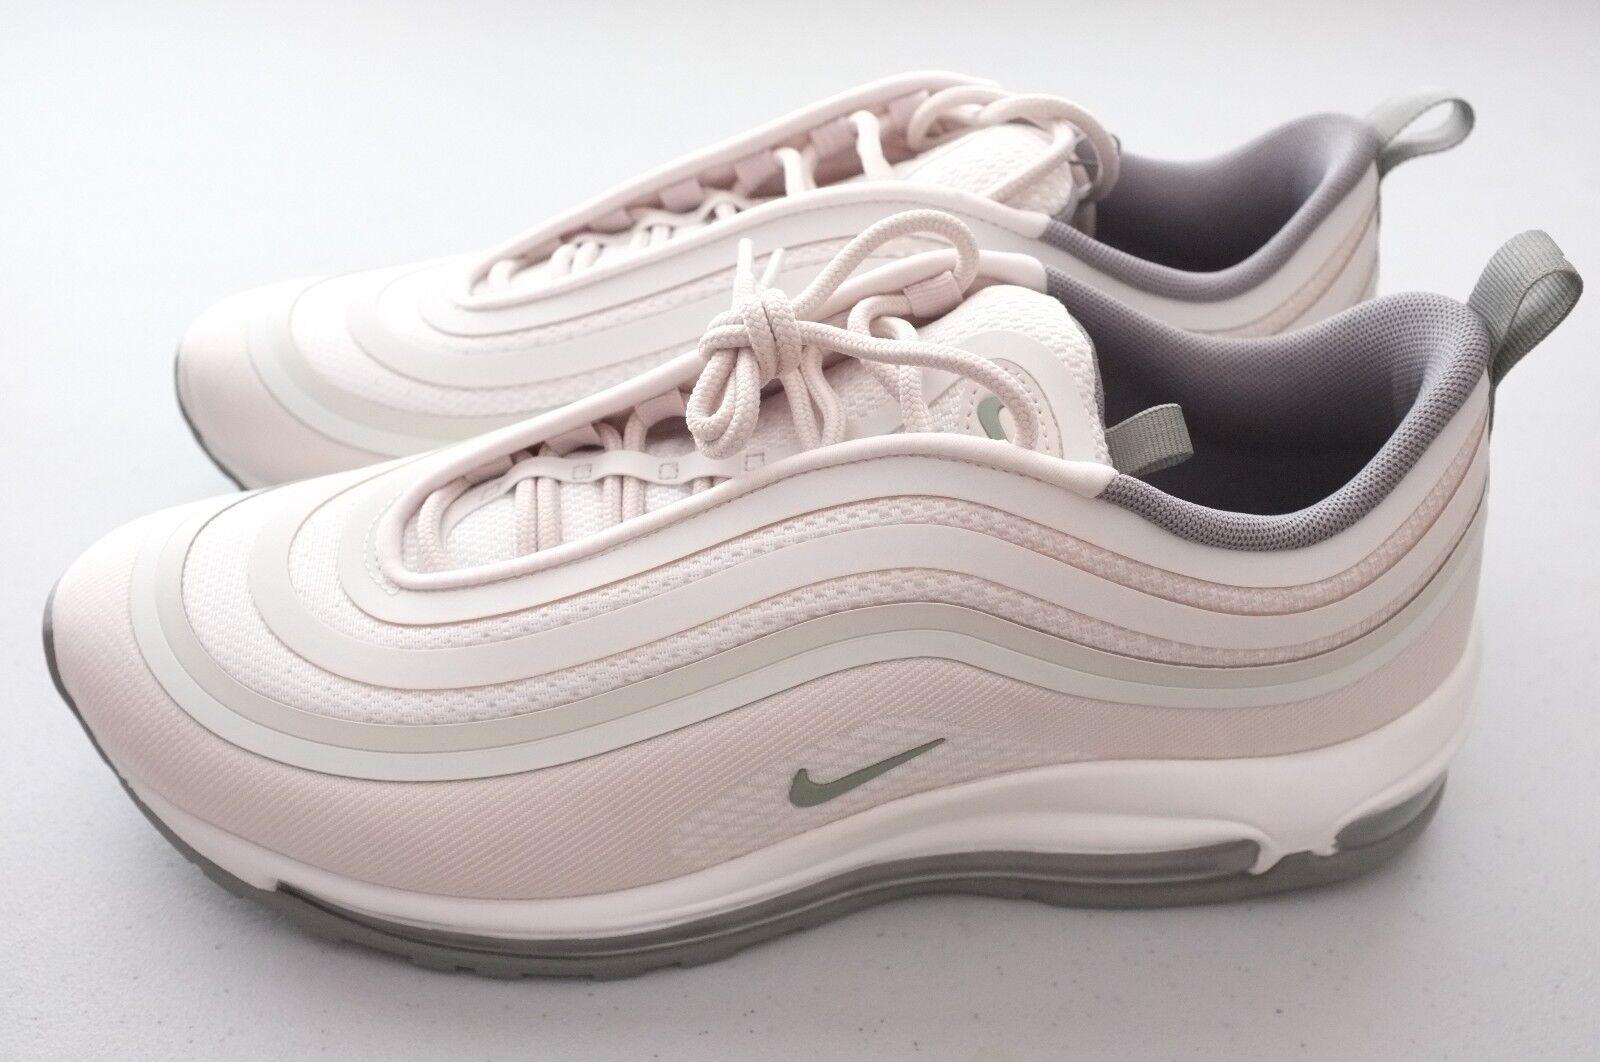 Nike Air Max 97 Ultra 17 Light Orewood Brown Running shoes 917704-100 Wmns Sz 12